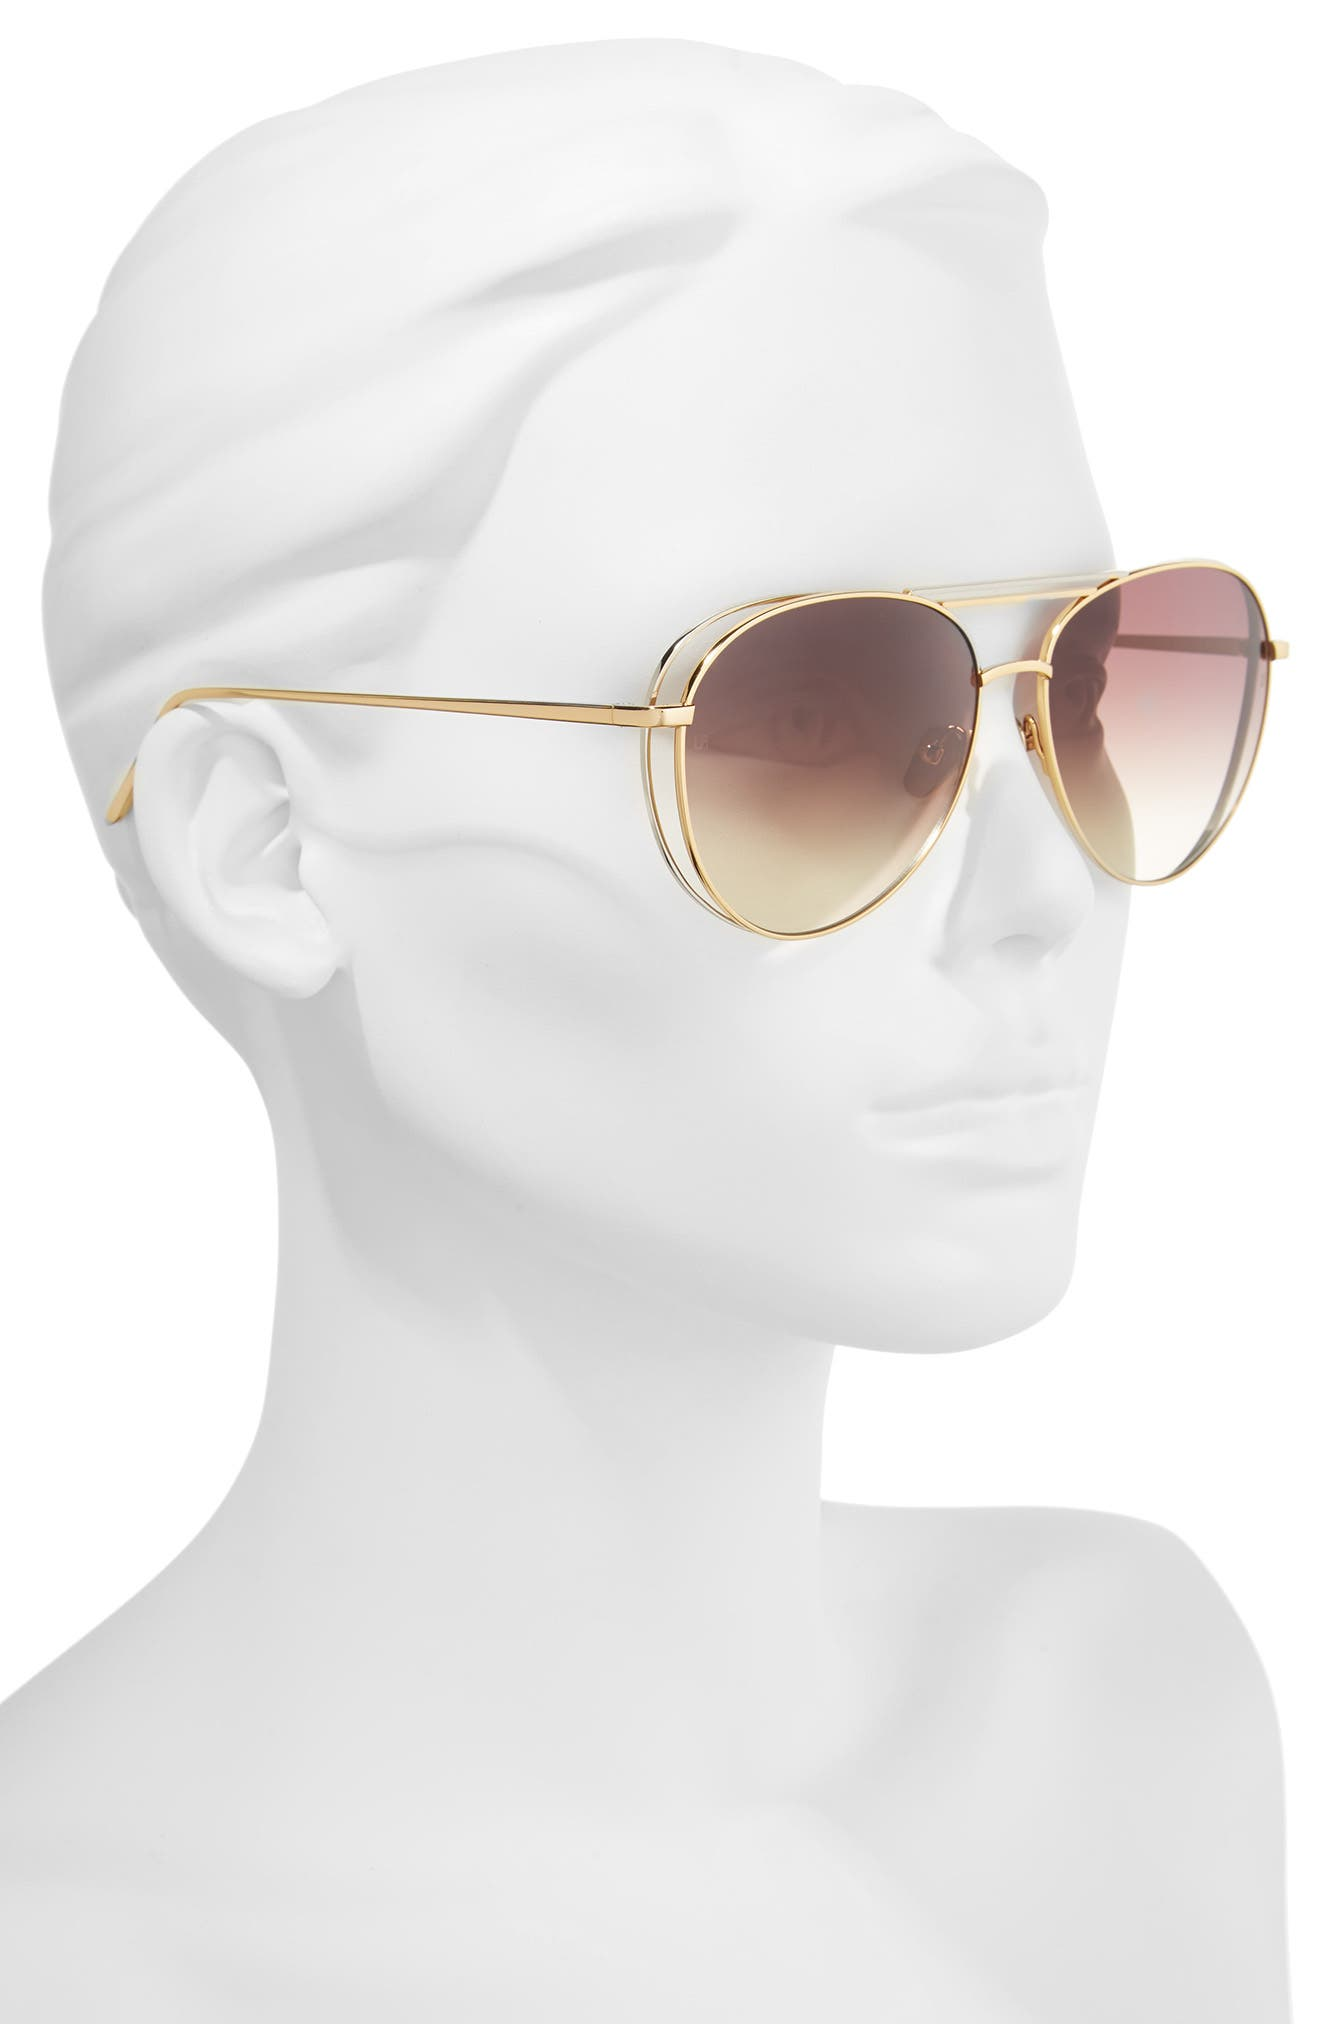 61mm 18 Karat Gold Aviator Sunglasses,                             Alternate thumbnail 5, color,